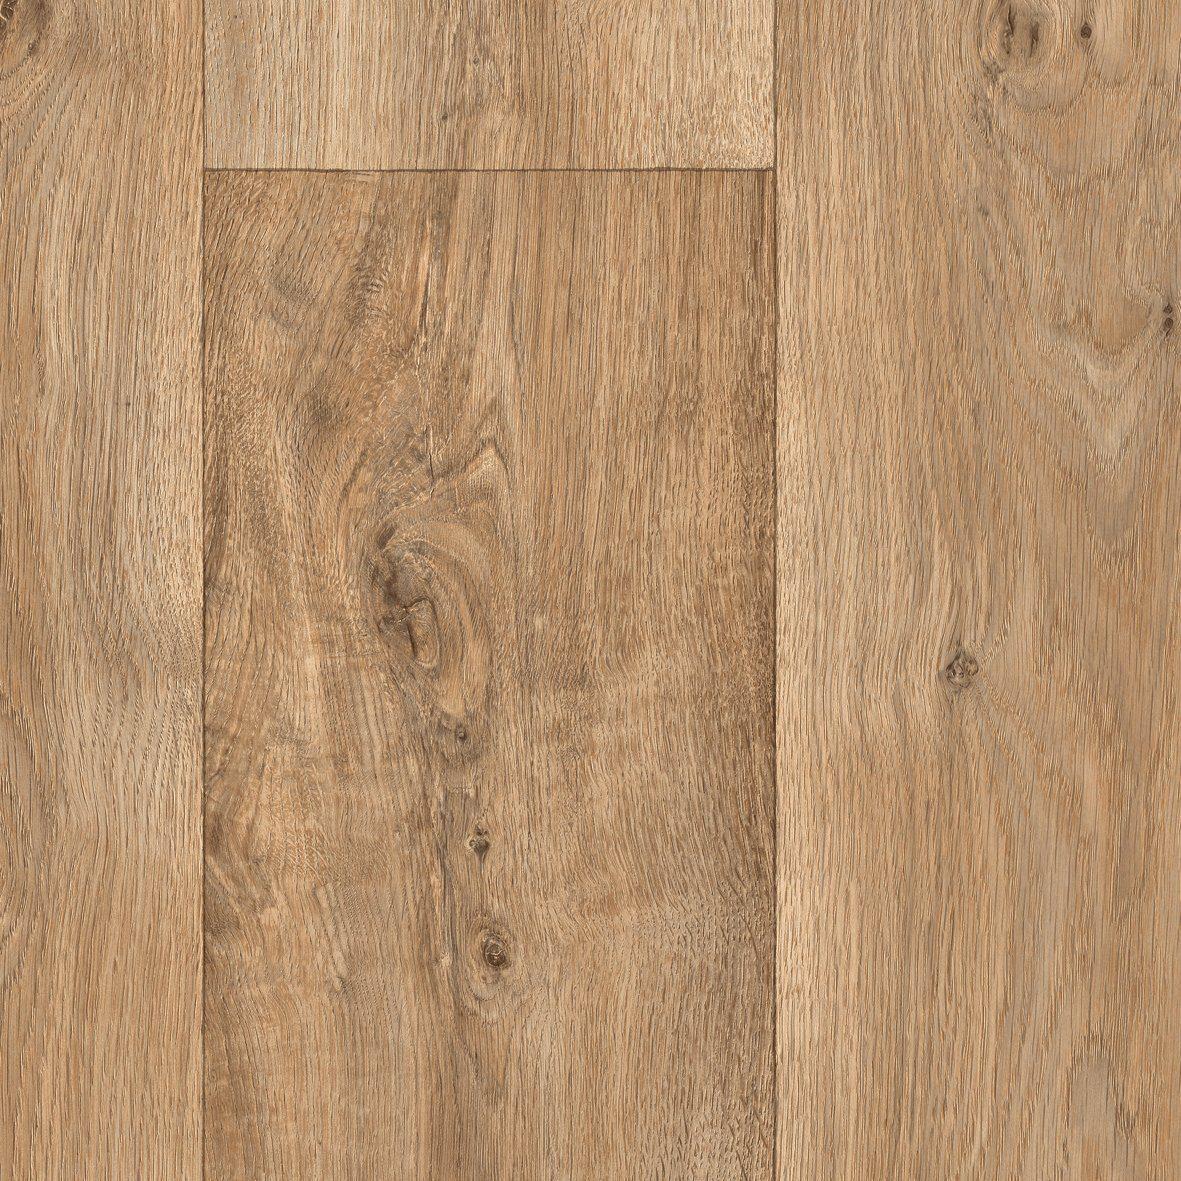 ANDIAMO PVC-Boden »Ursio braun«, Breite 200 cm